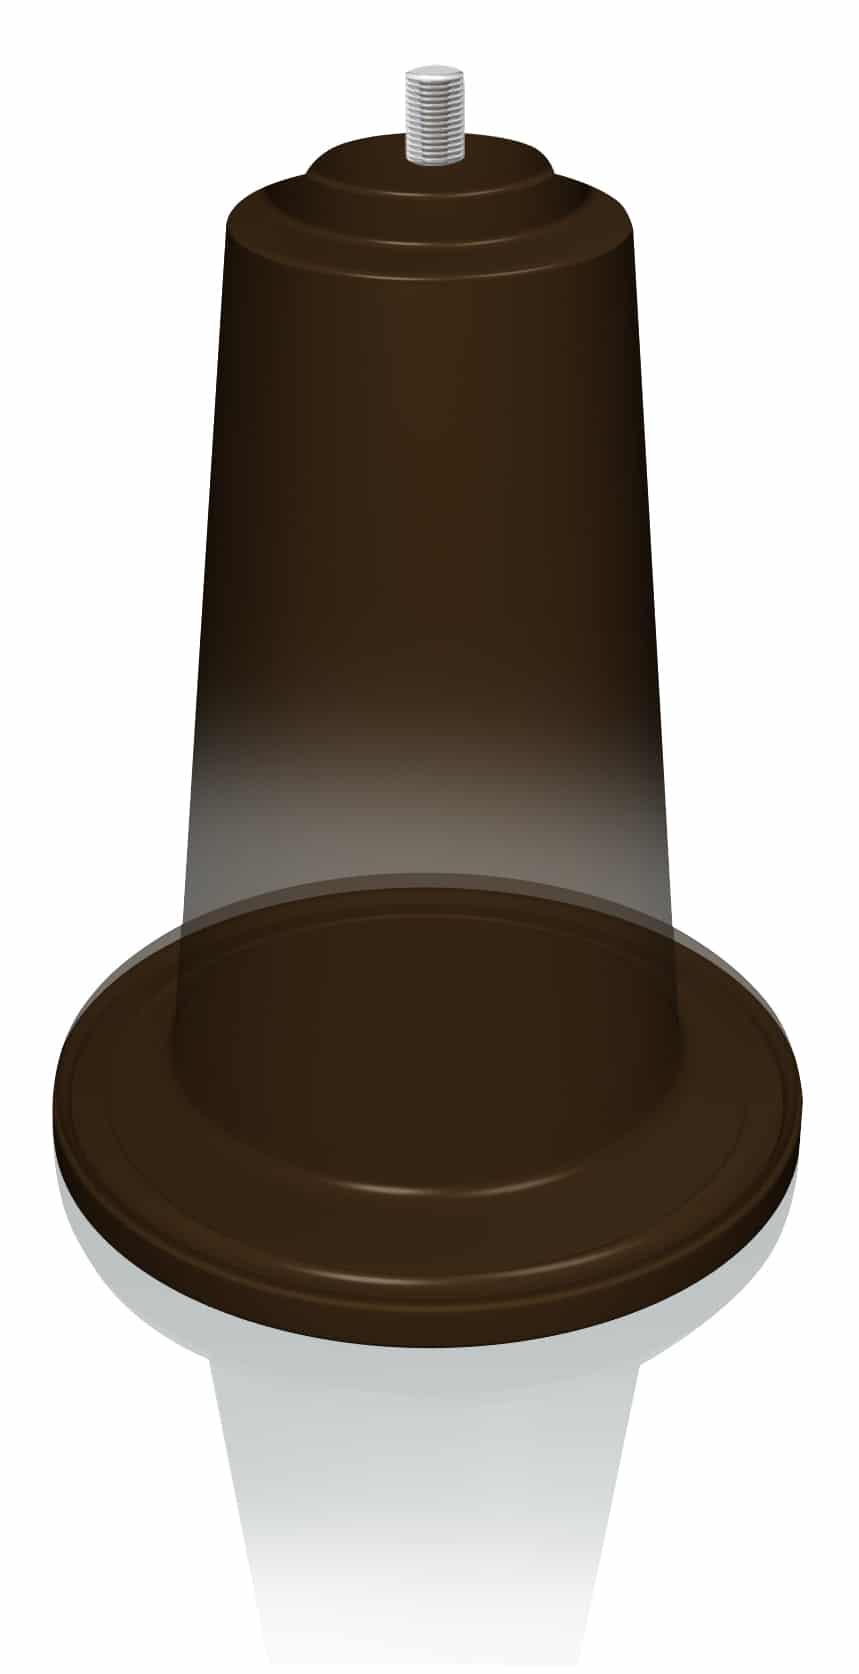 Slipstick Gripper Glide Cup Cb885 Slipstick Foot